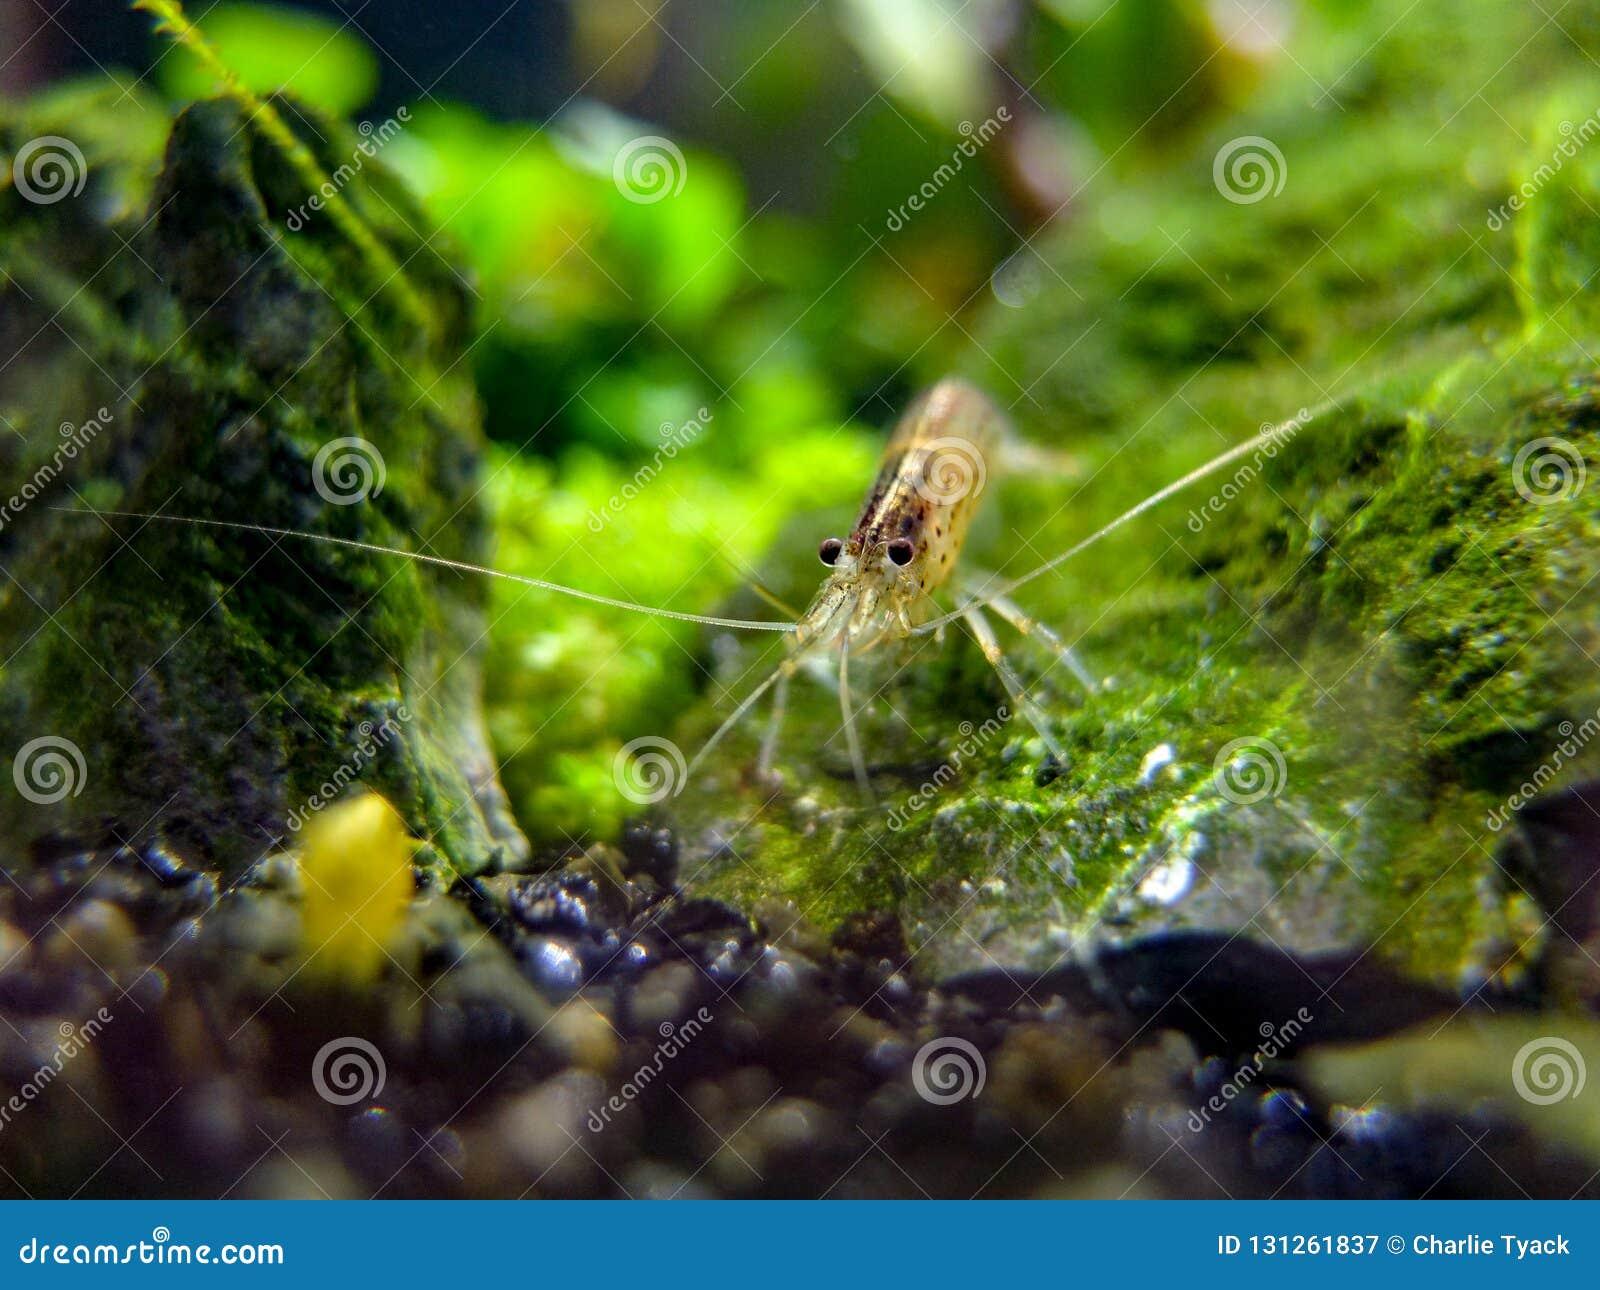 Eye to eye with an amano shrimp